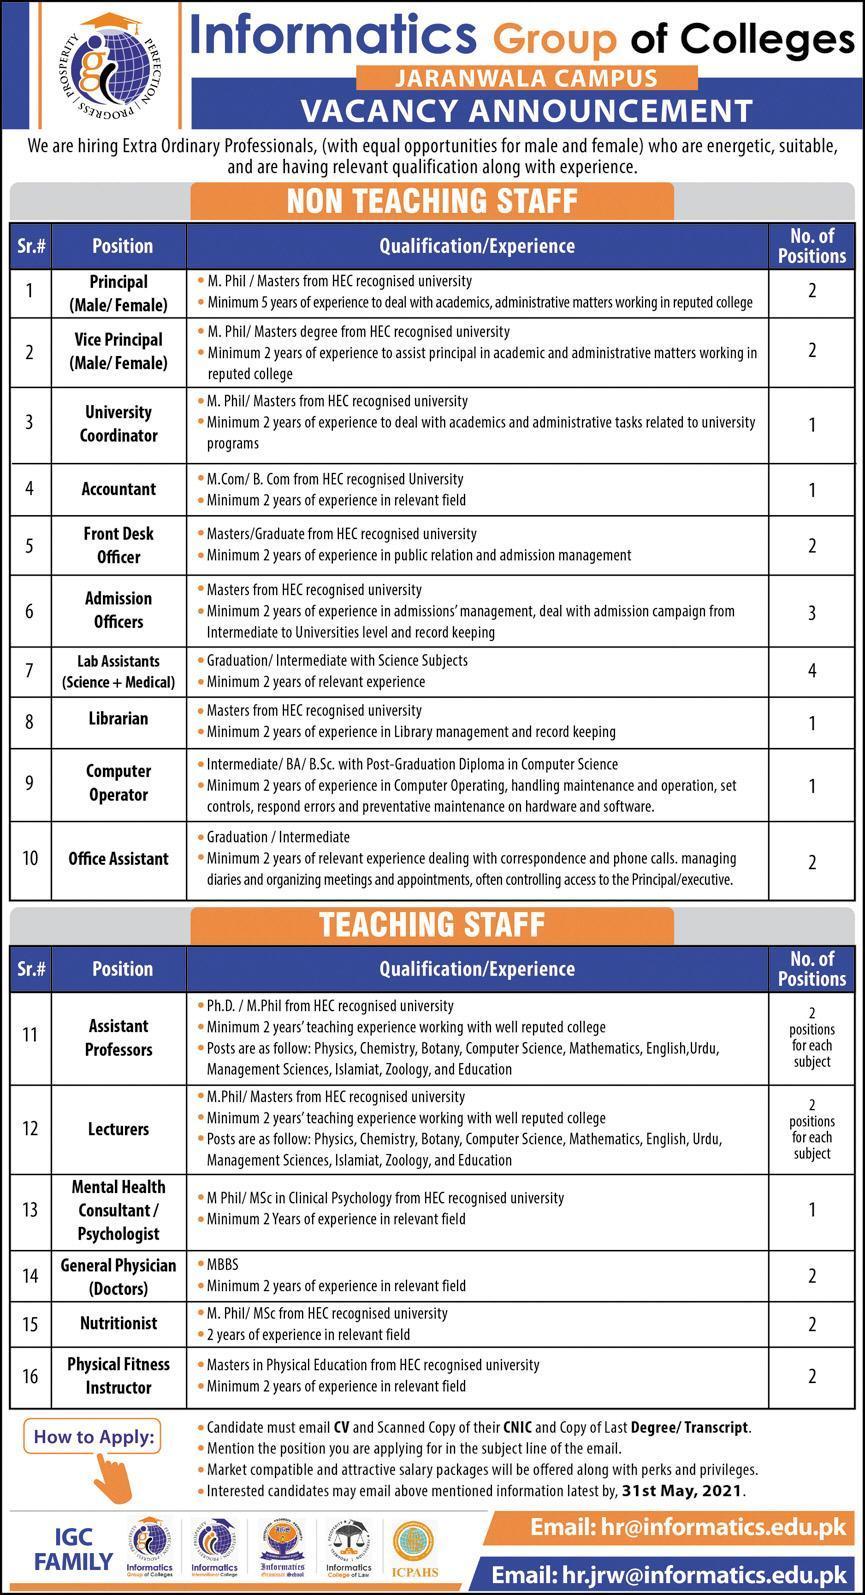 Informatics Group of Colleges Jaranwala Campus Jobs 2021